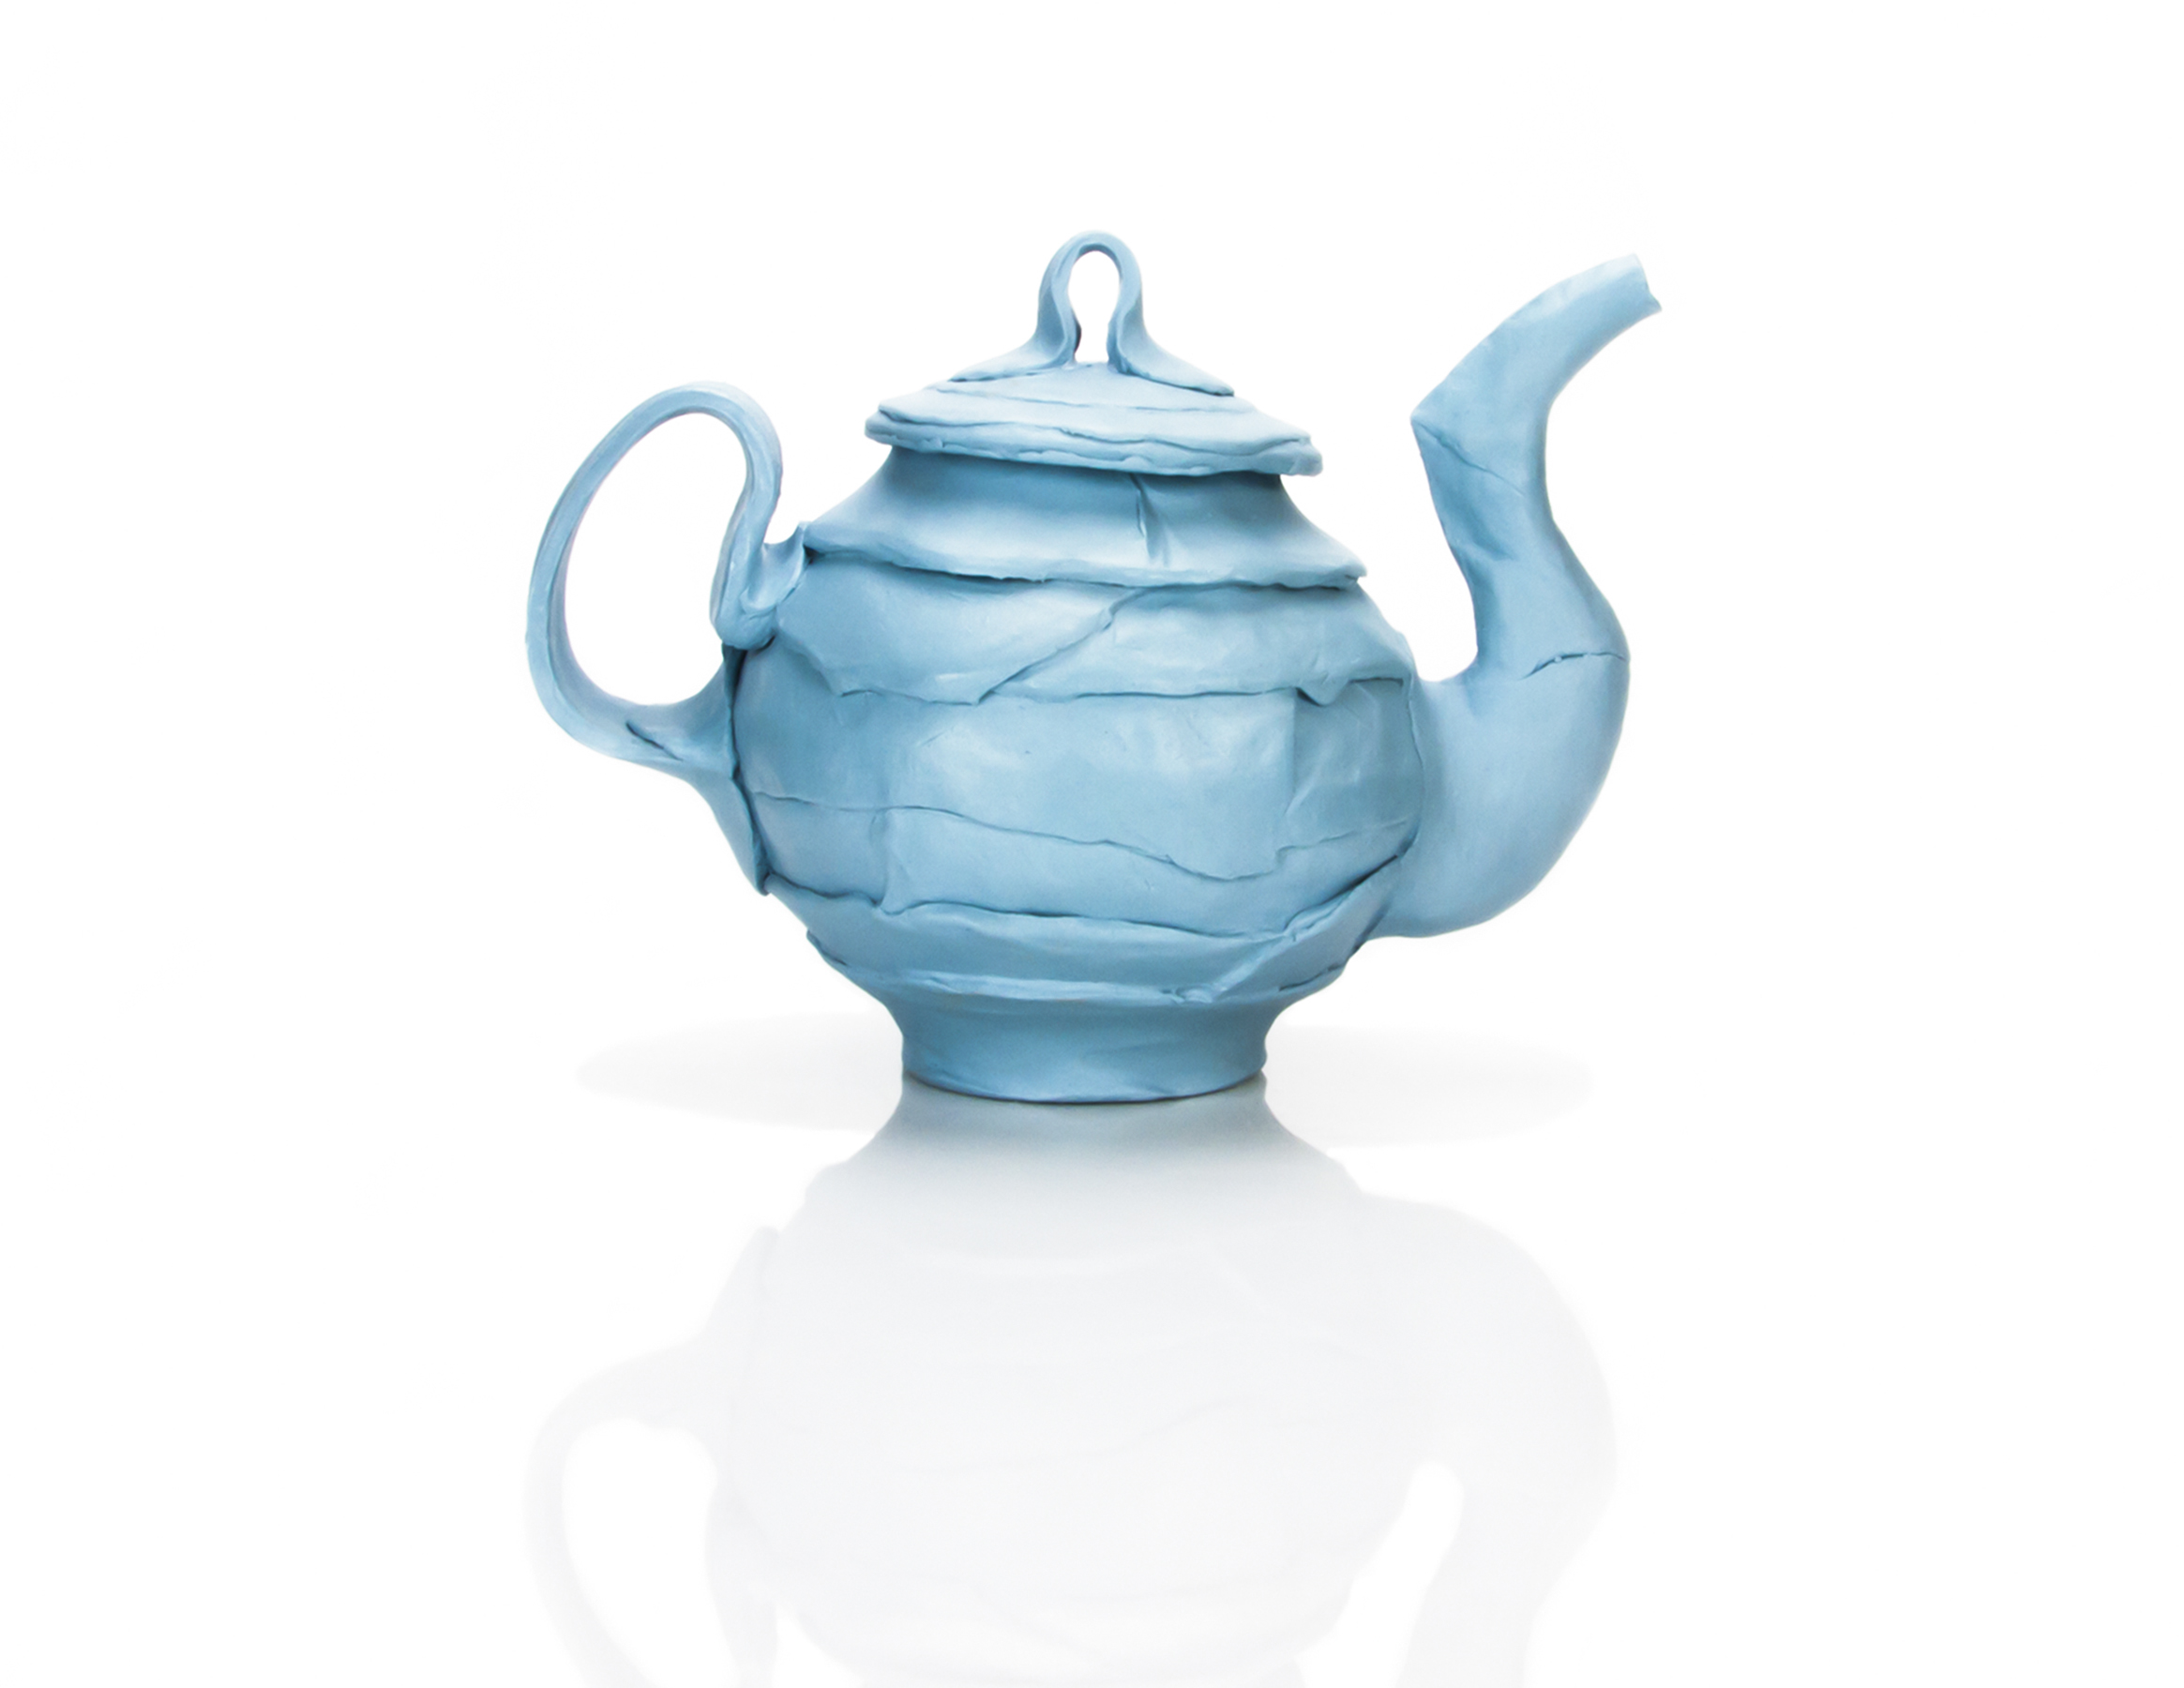 Donofrio_Justin_Robins Egg Teapot_A.jpg